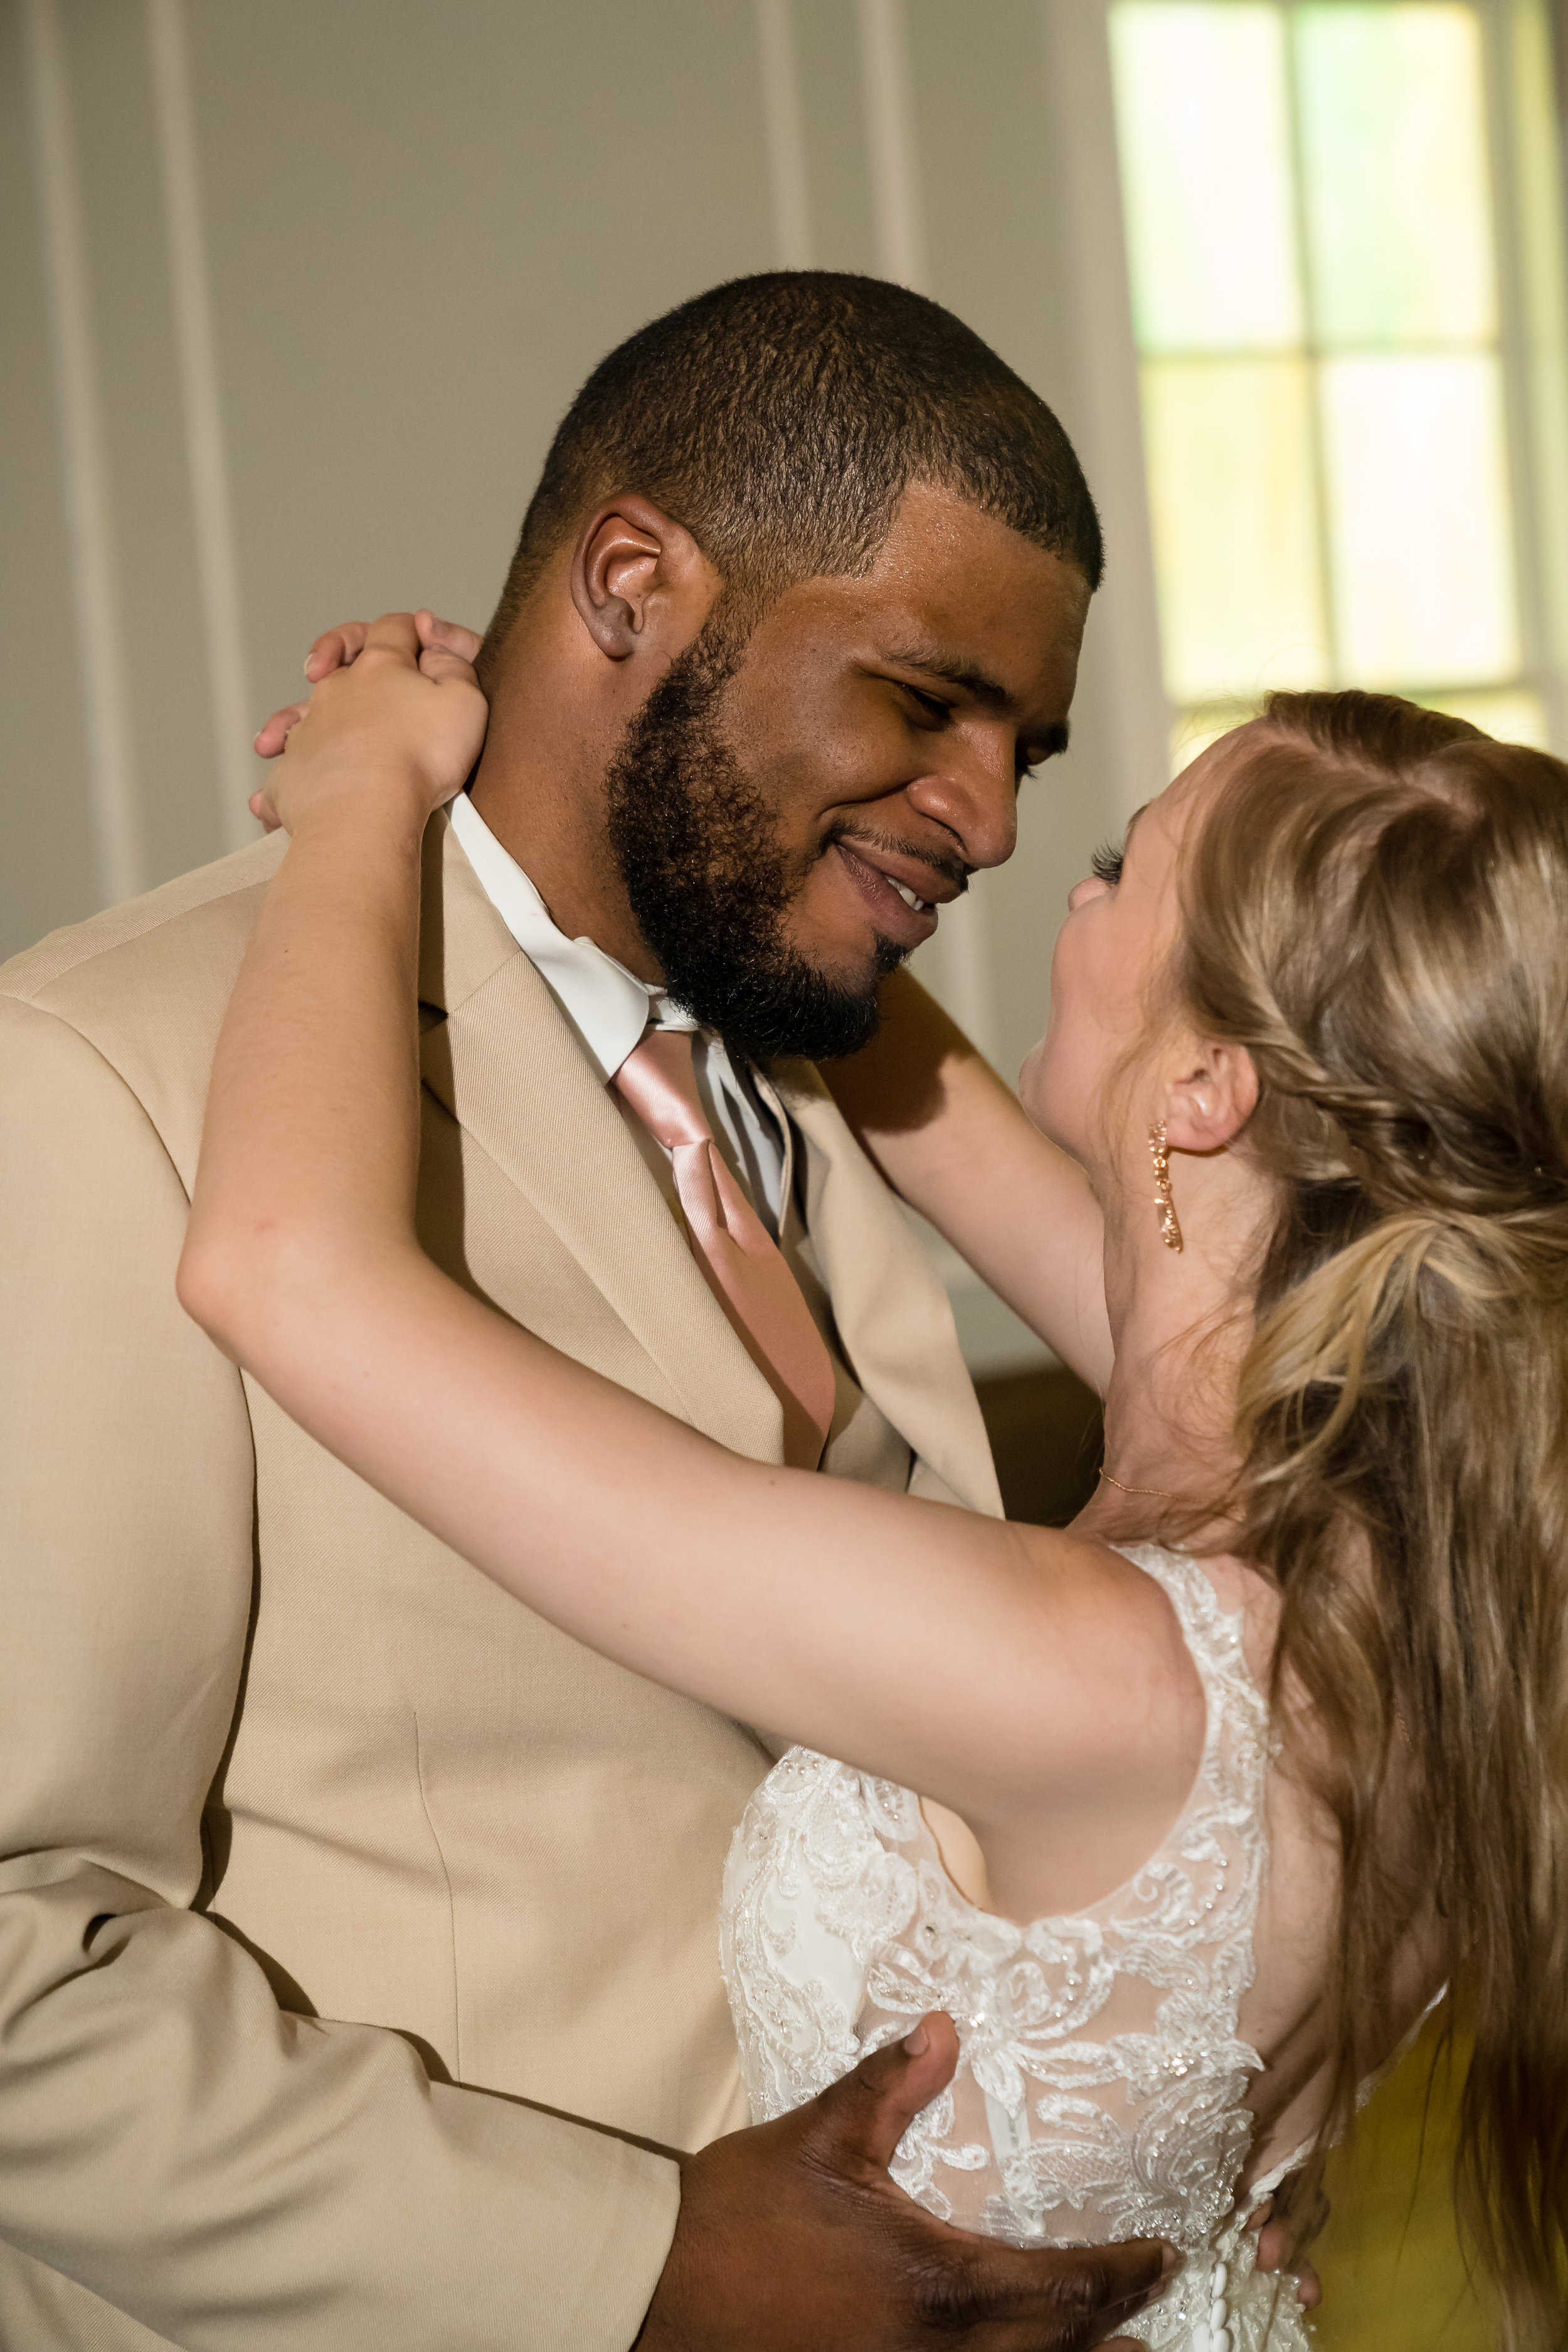 sarah_ikeem_wedding_at_the_parlour_at_manns_chapel_05.18.19-03318.jpg